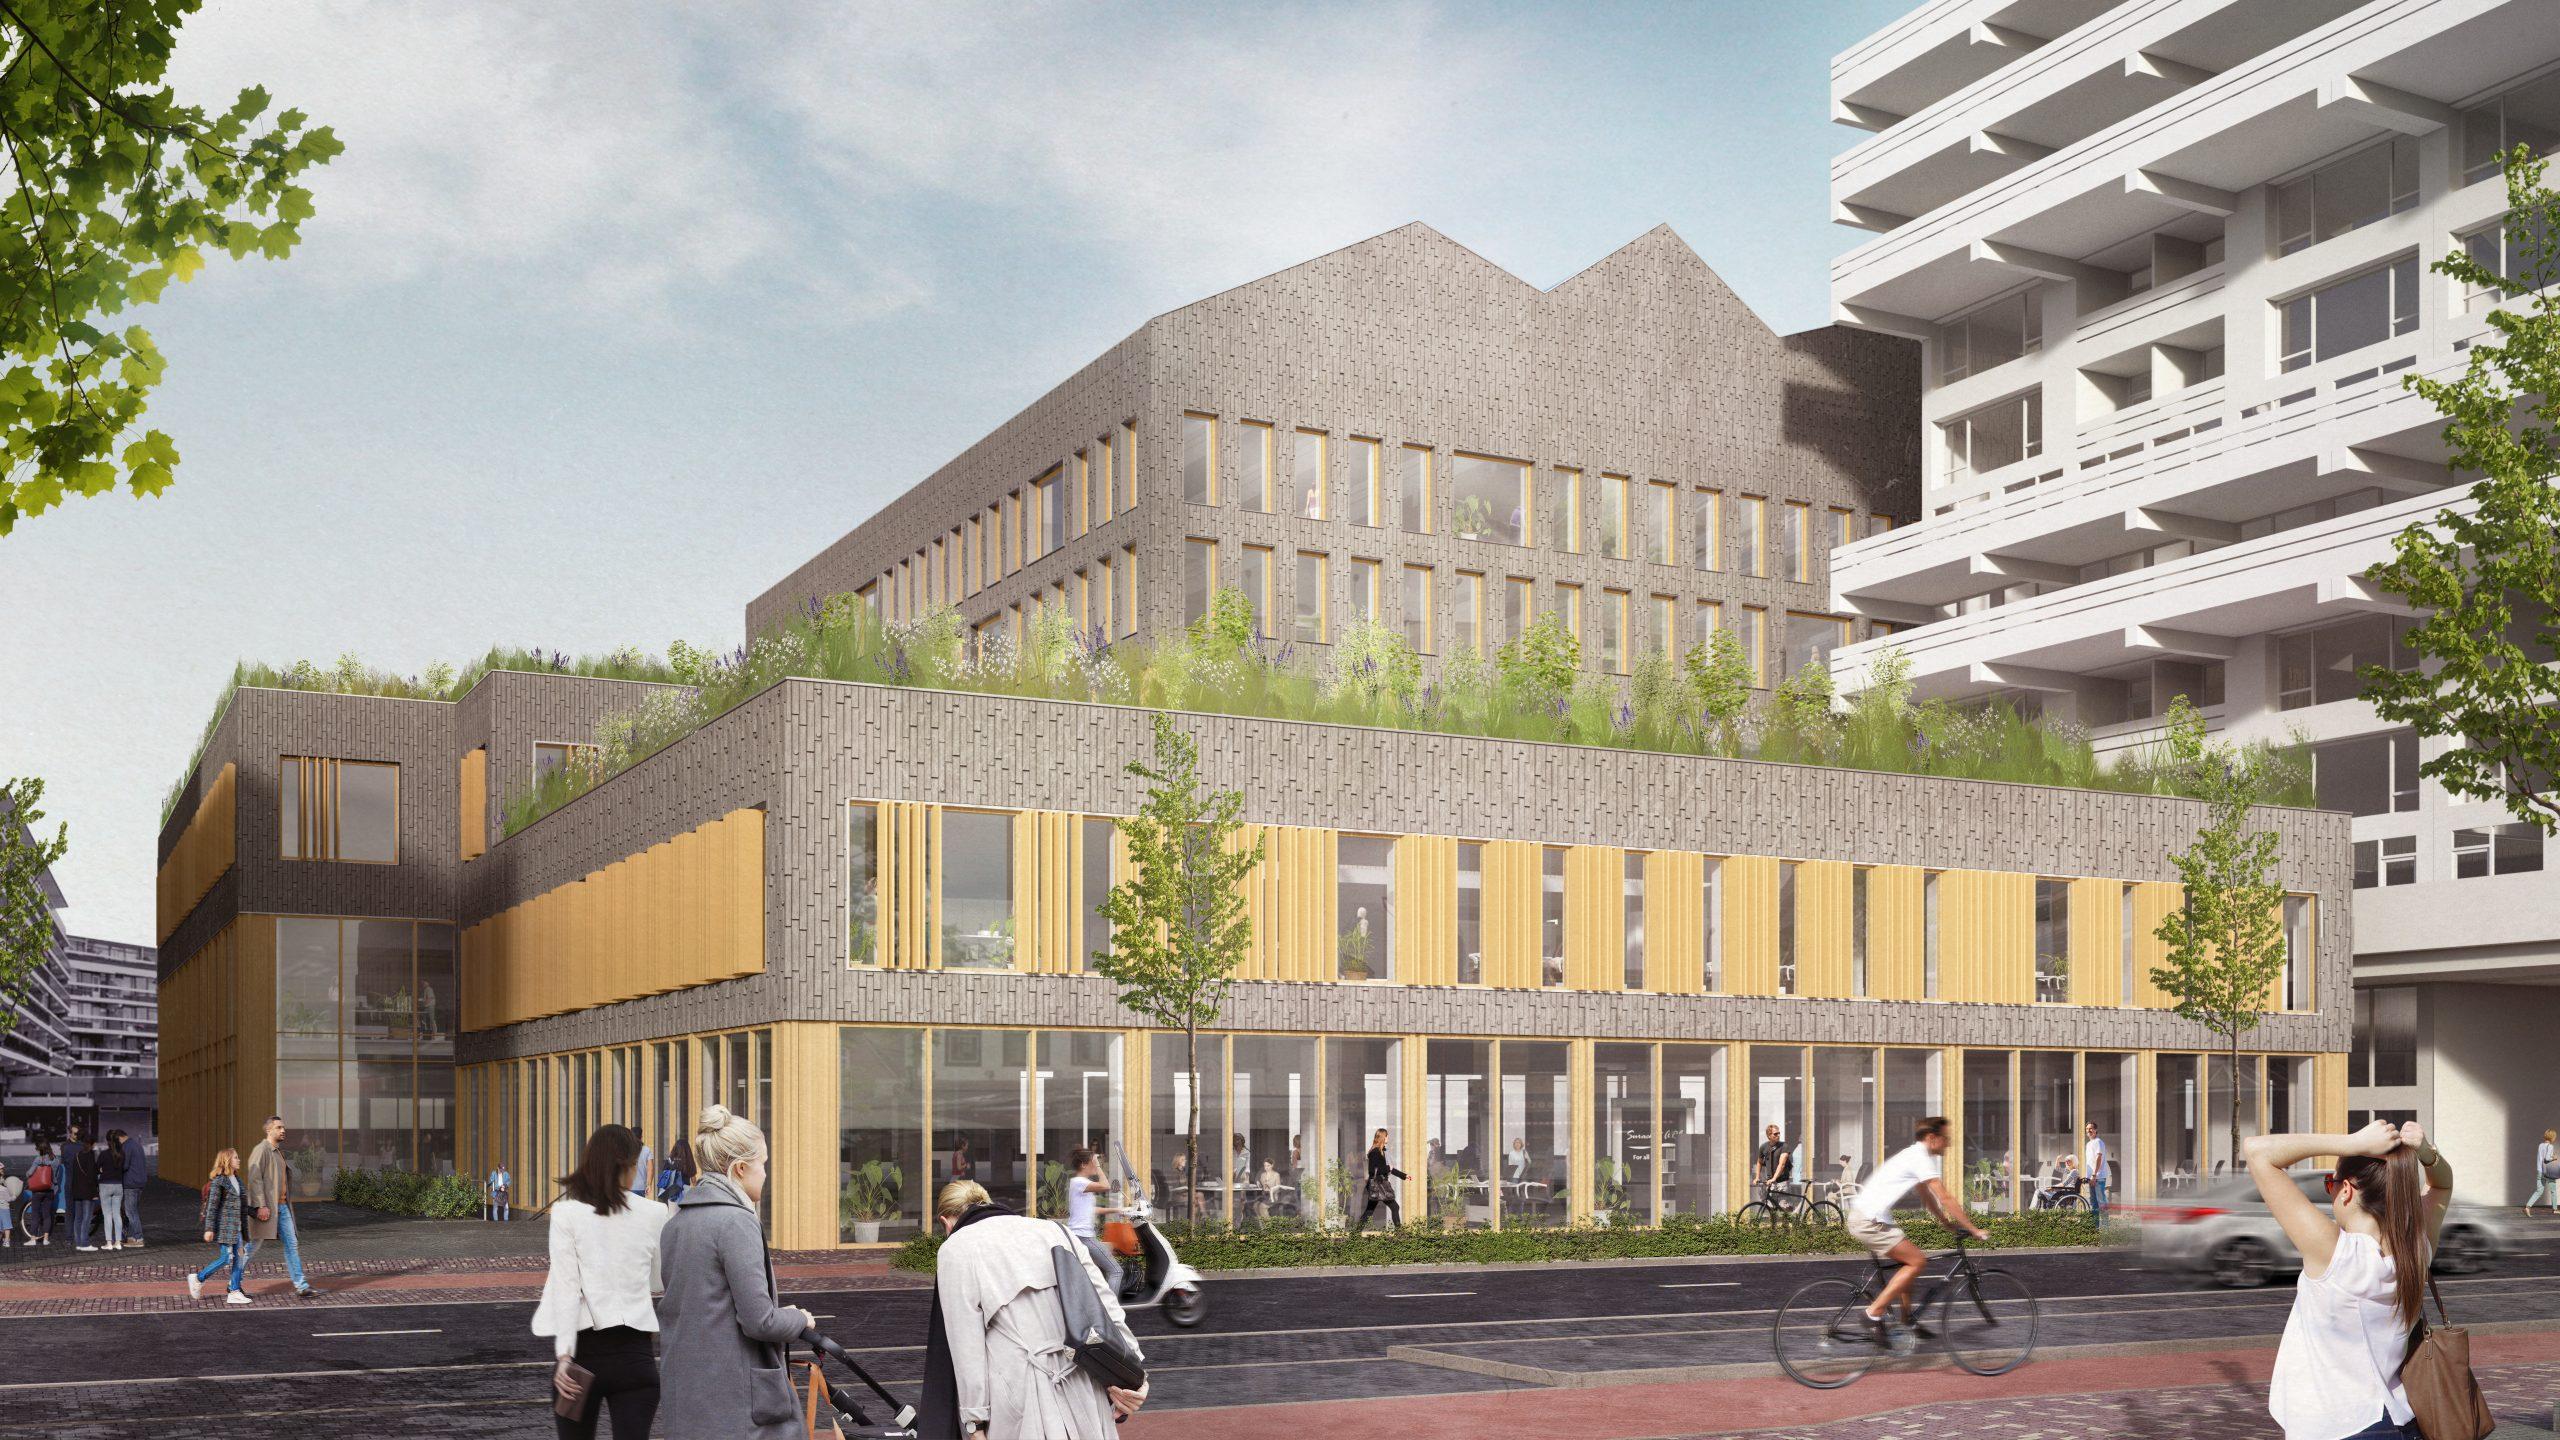 https://www.transformatie-stadswinkel.nl/wp-content/uploads/2021/02/190212-CA-Tilburg-sceneD-01-scaled.jpg